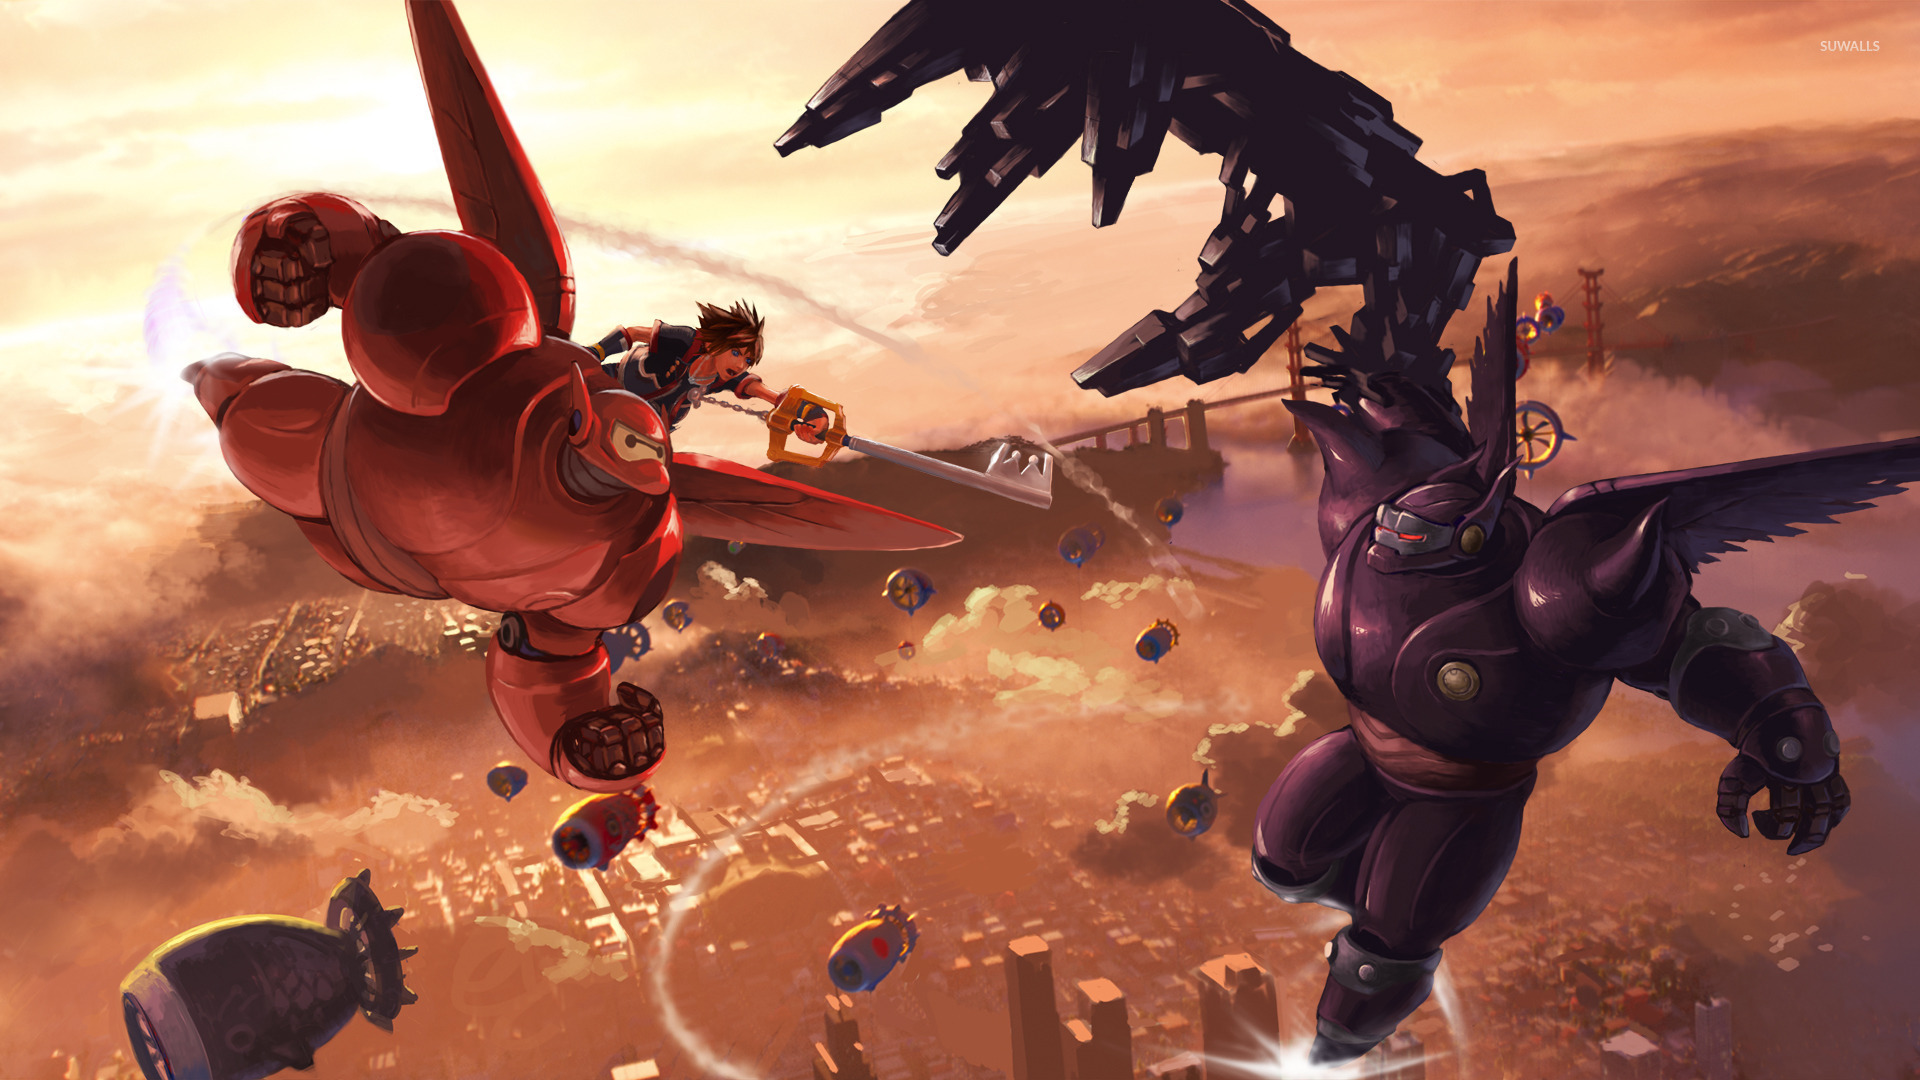 Concept art of 'Big Hero 6' in 'Kingdom Hearts 3.'